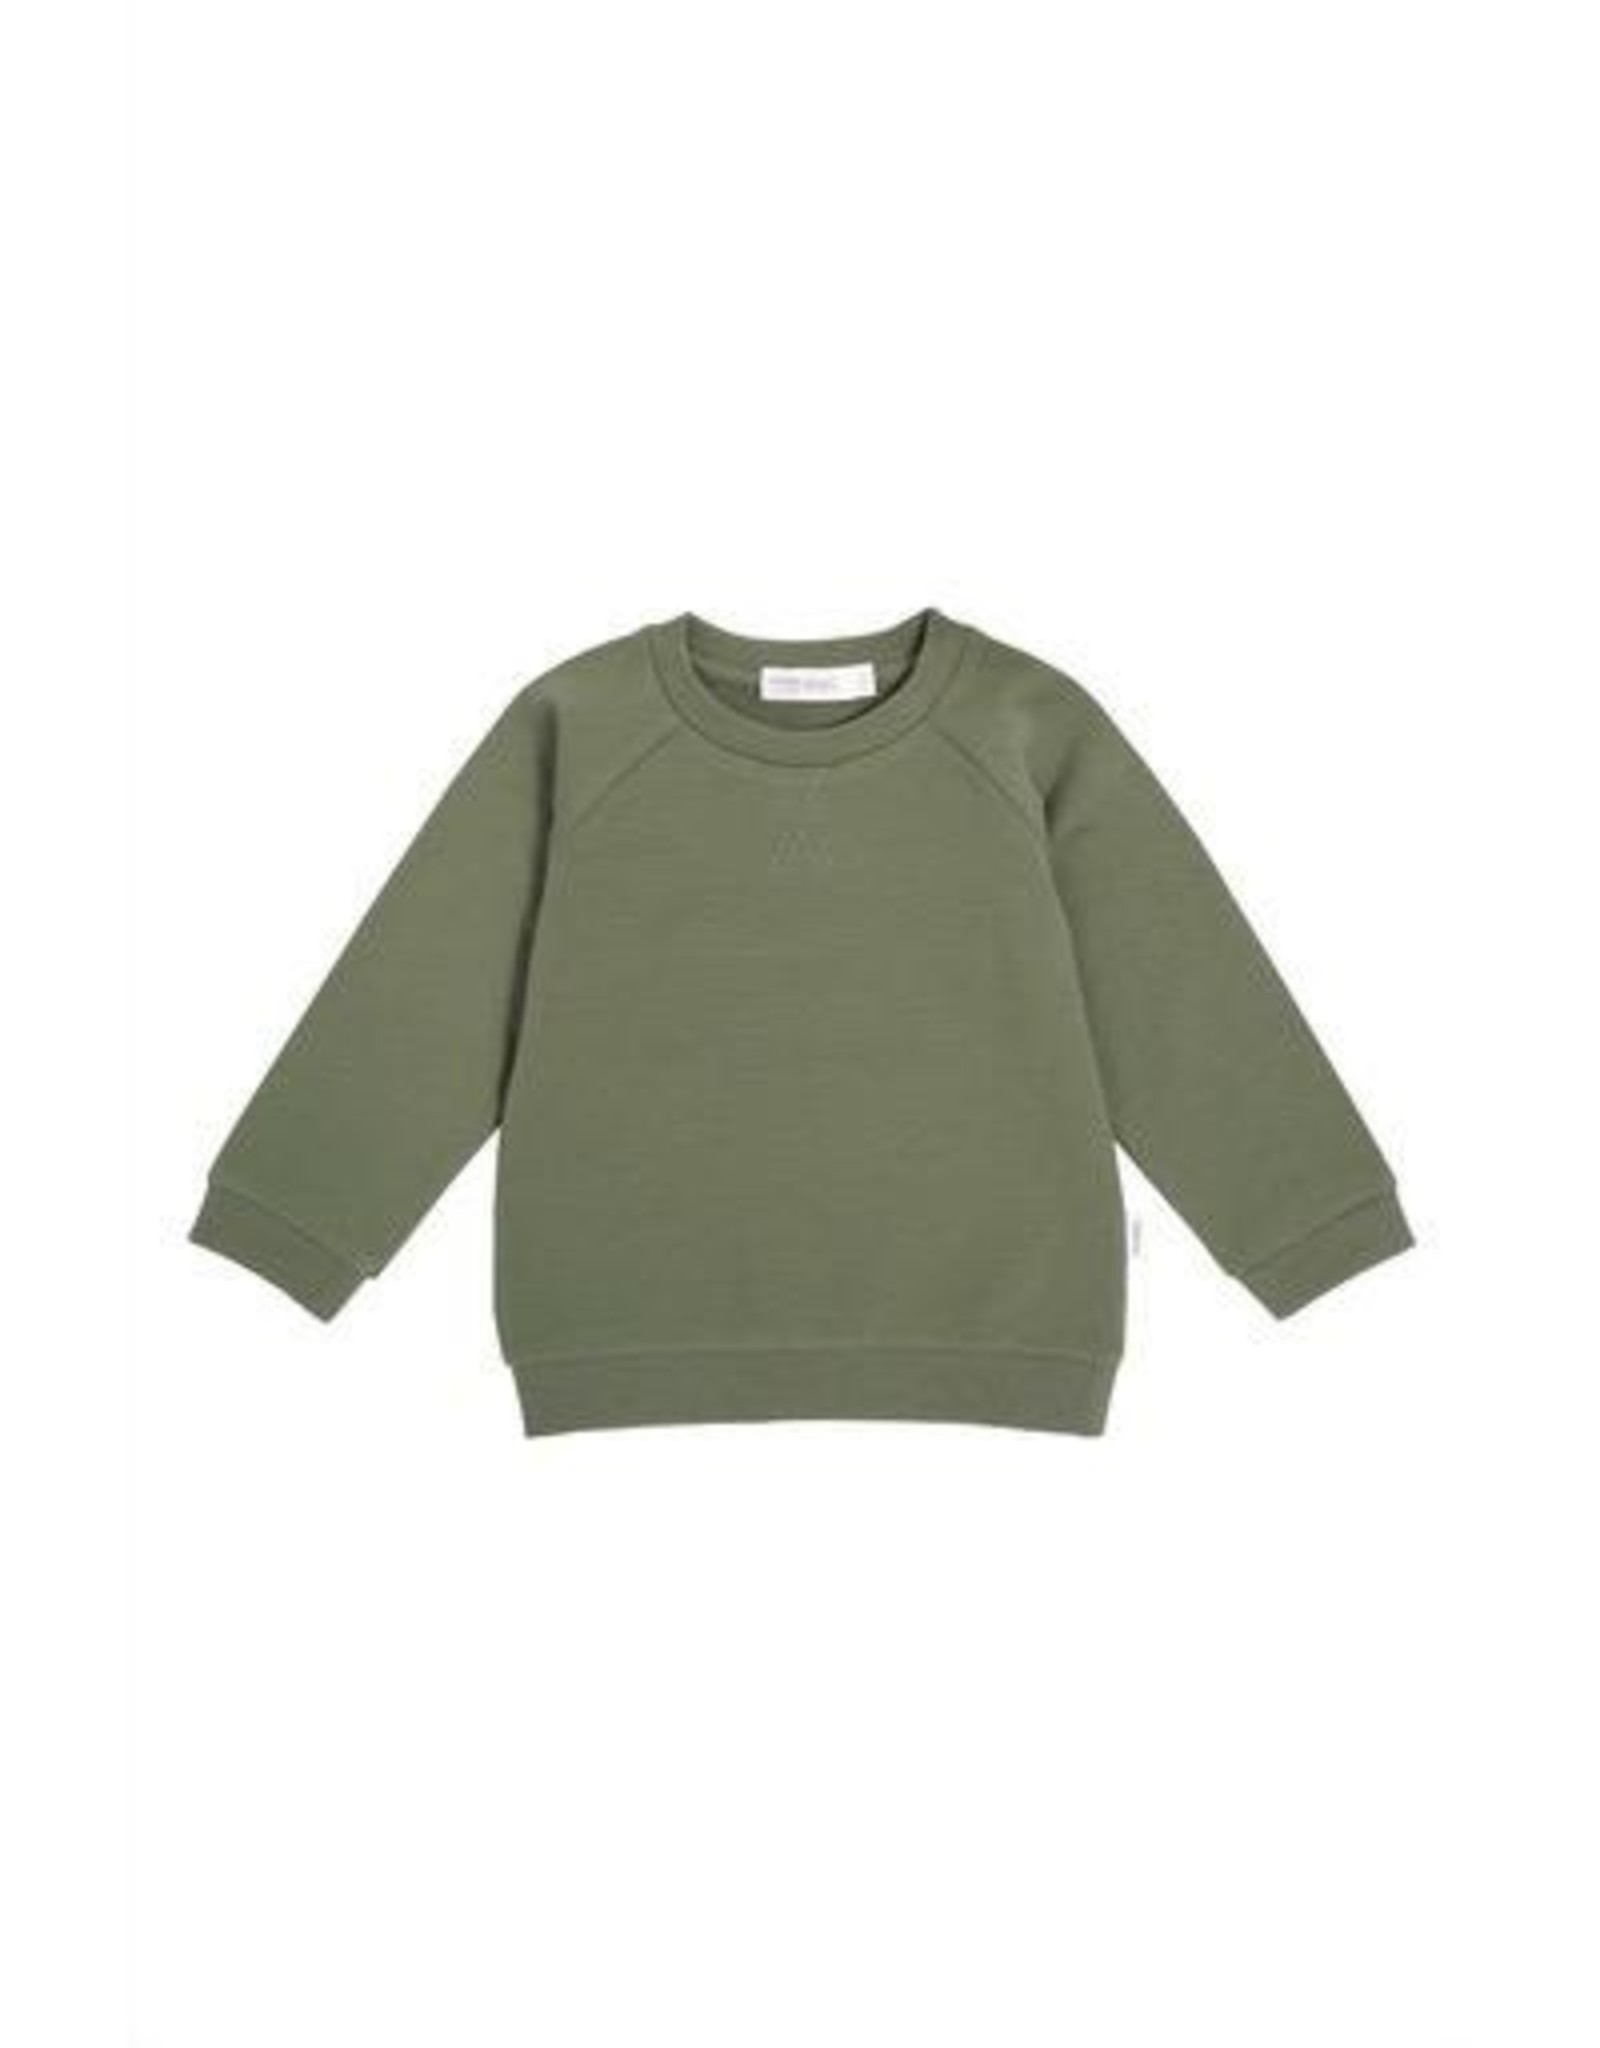 Khaki Baby Sweatshirt Knit